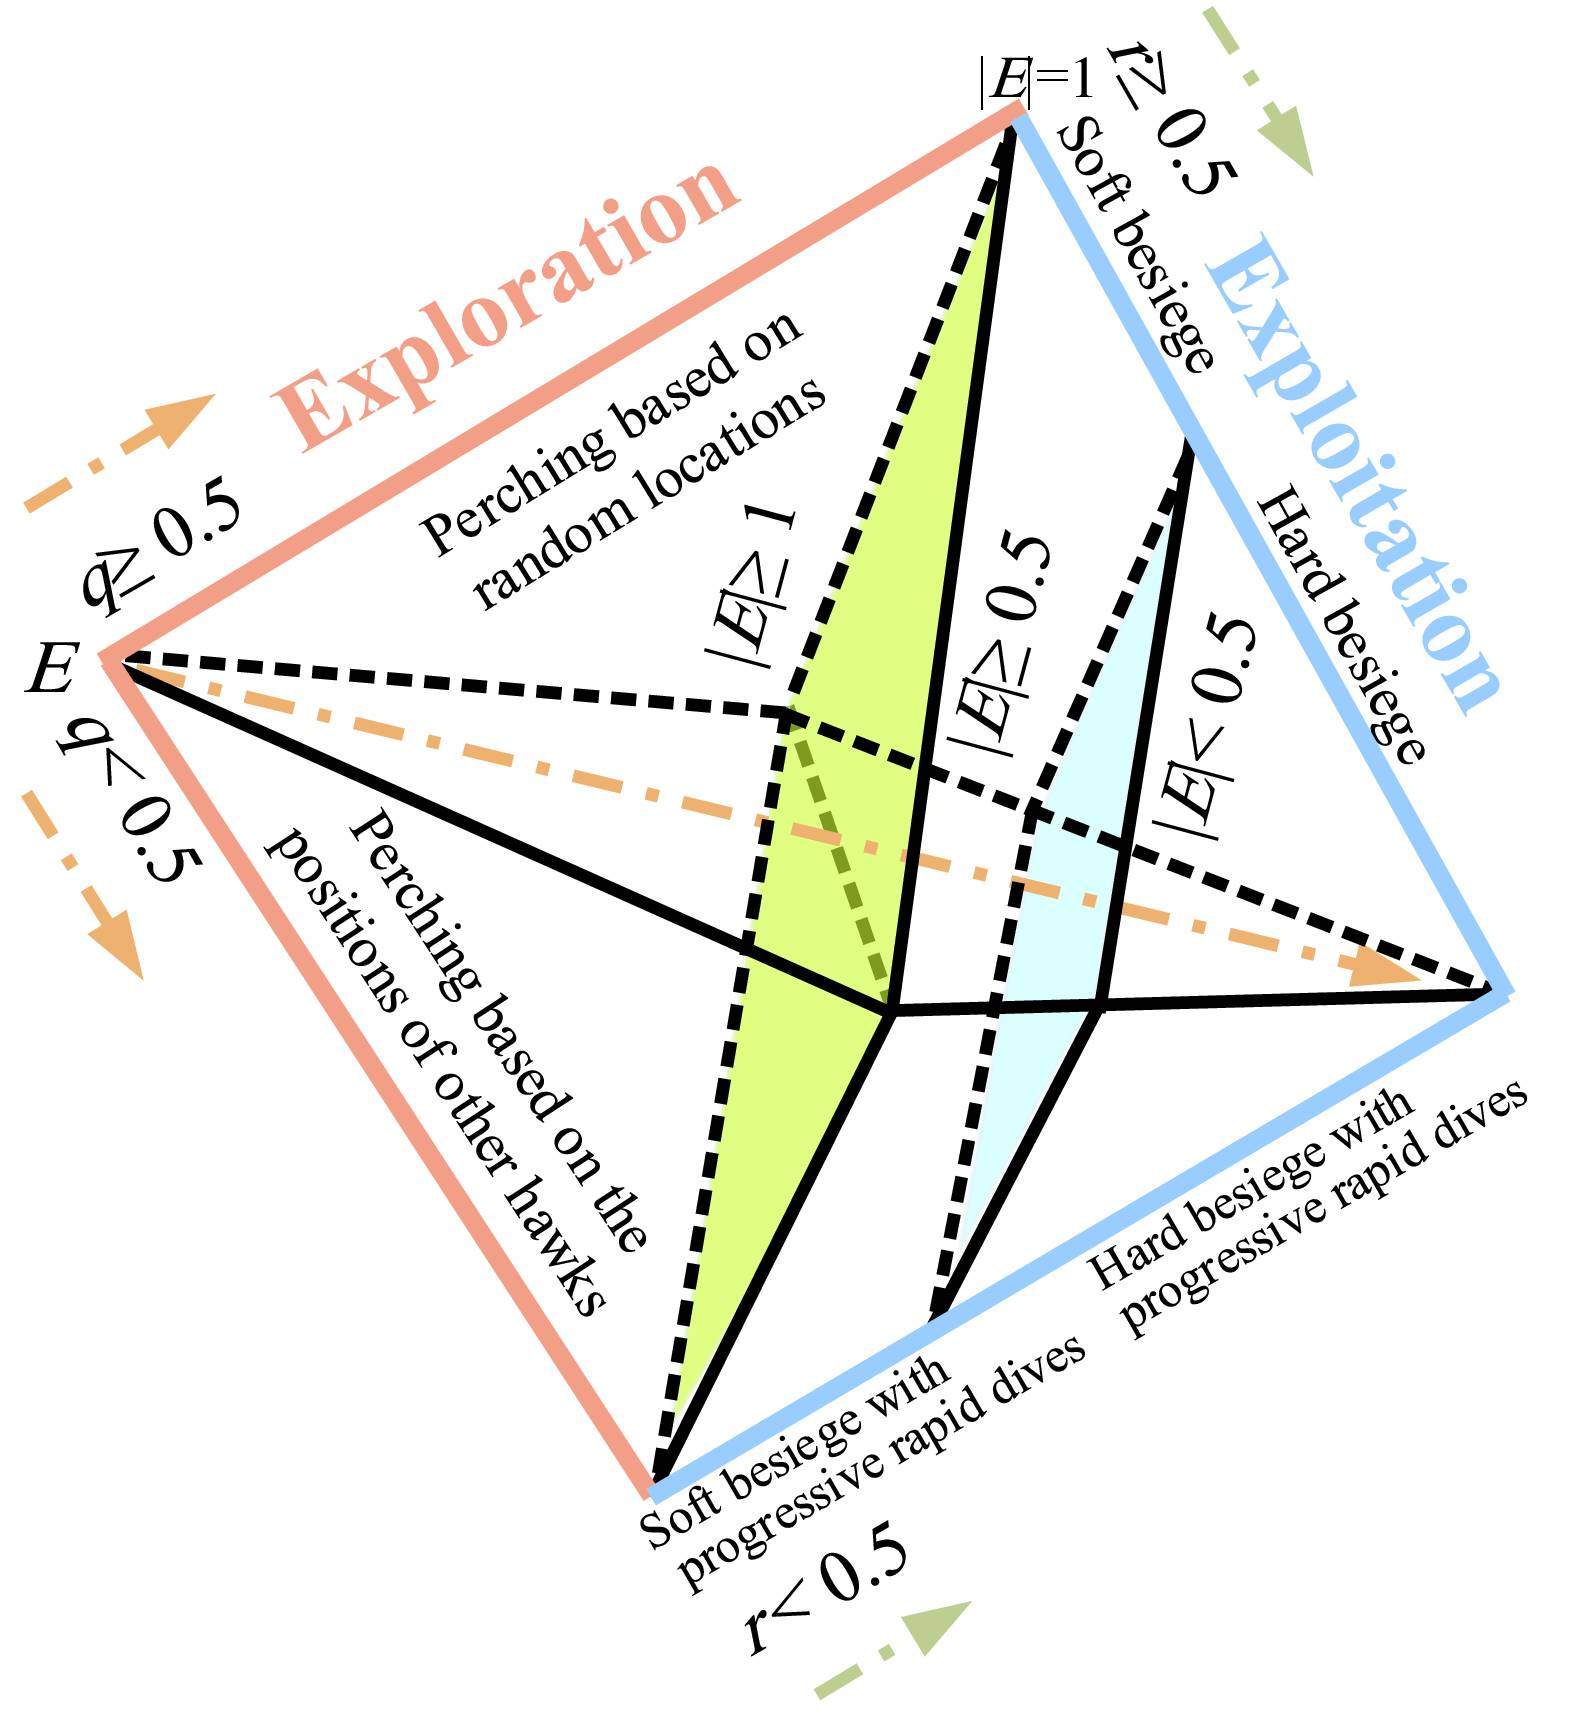 Harris hawks optimization (HHO): Algorithm and applications